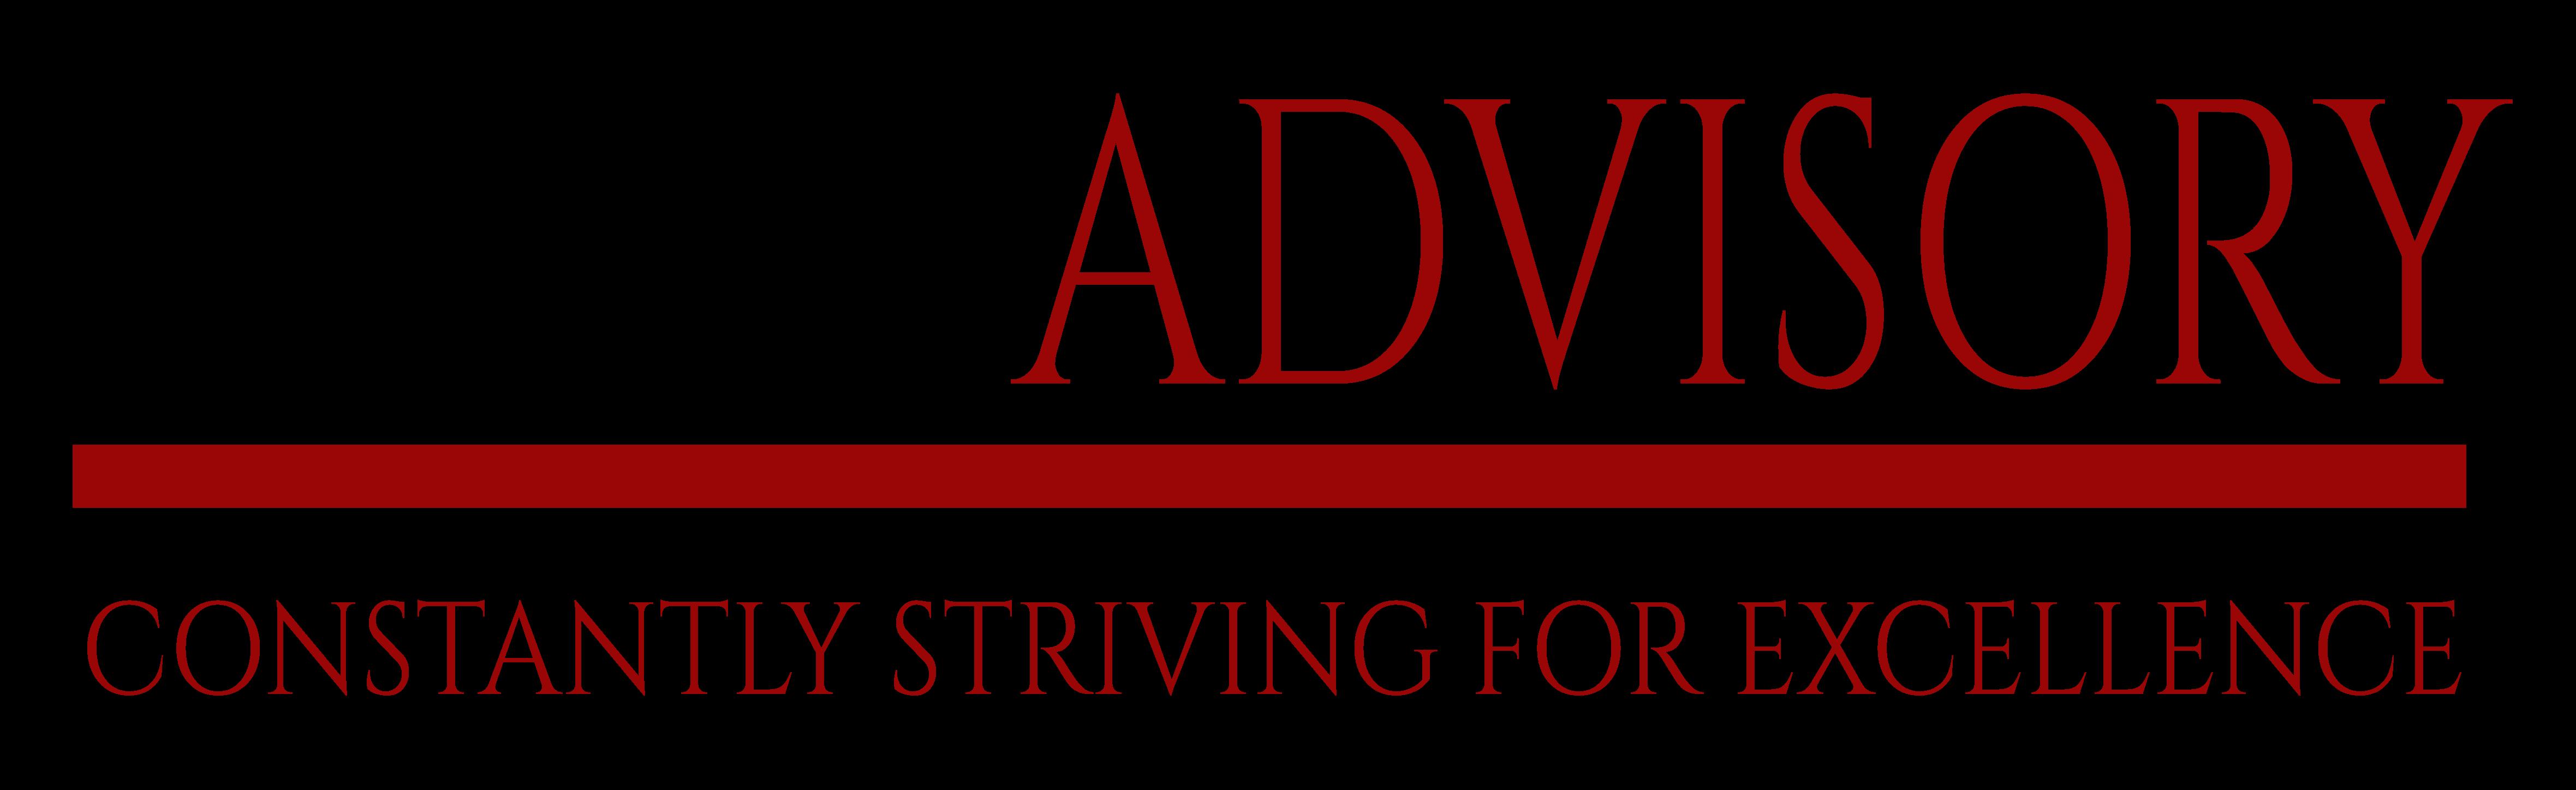 Prime Advisory